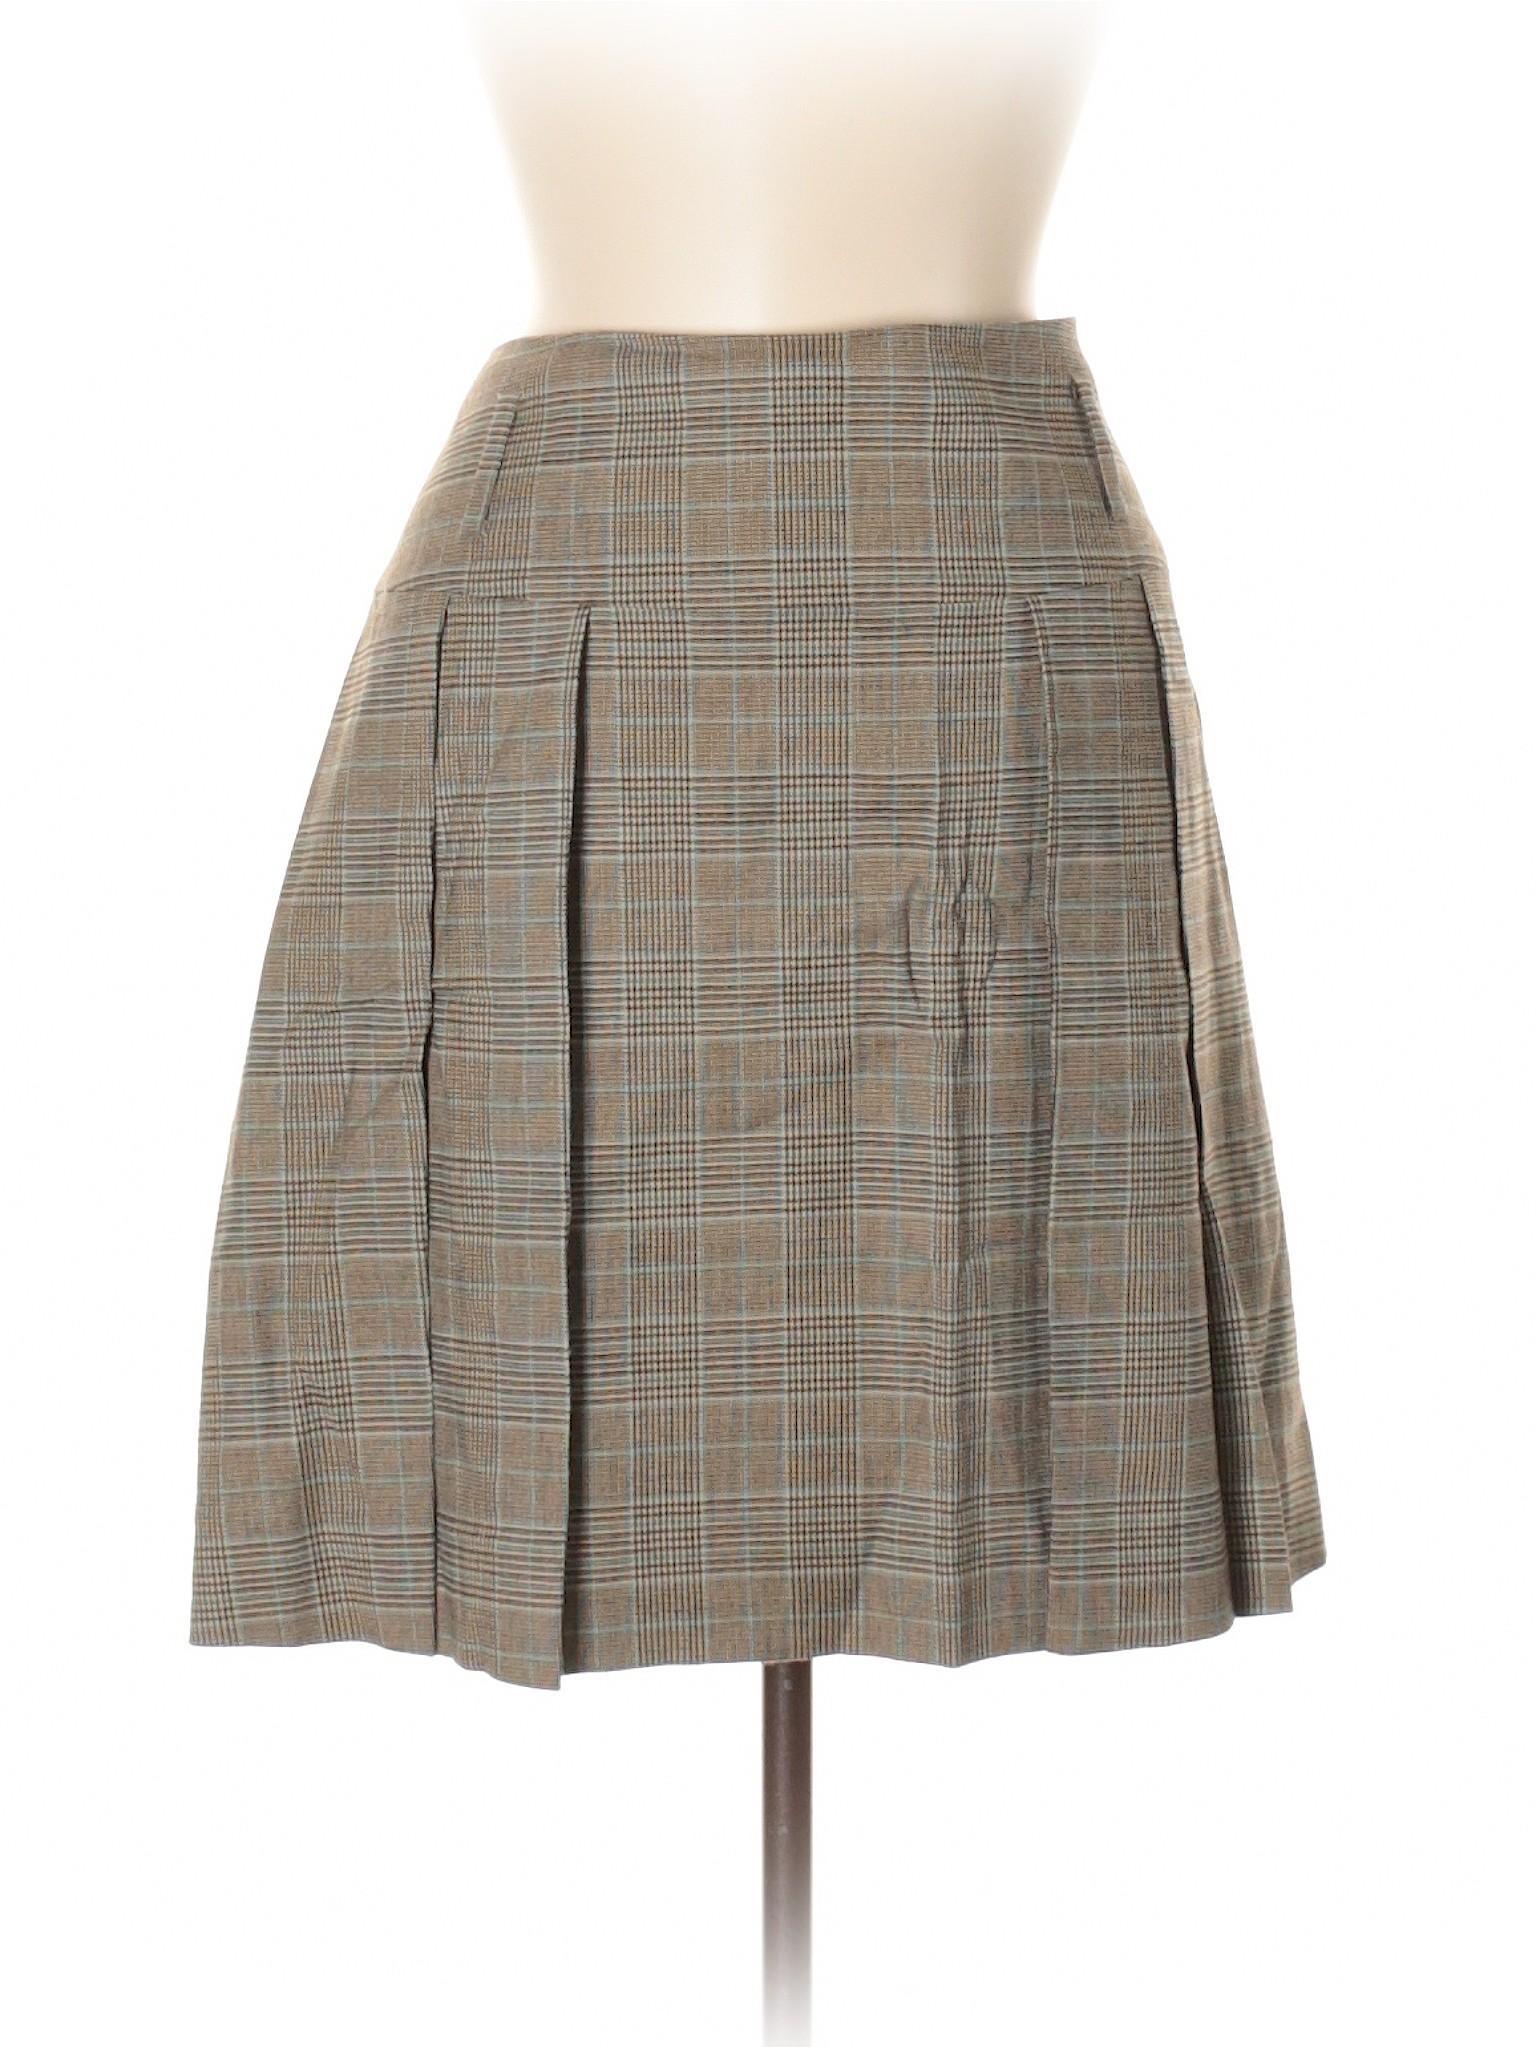 Boutique Boutique Skirt Skirt Casual Casual Casual Casual Skirt Boutique Boutique aYffq0